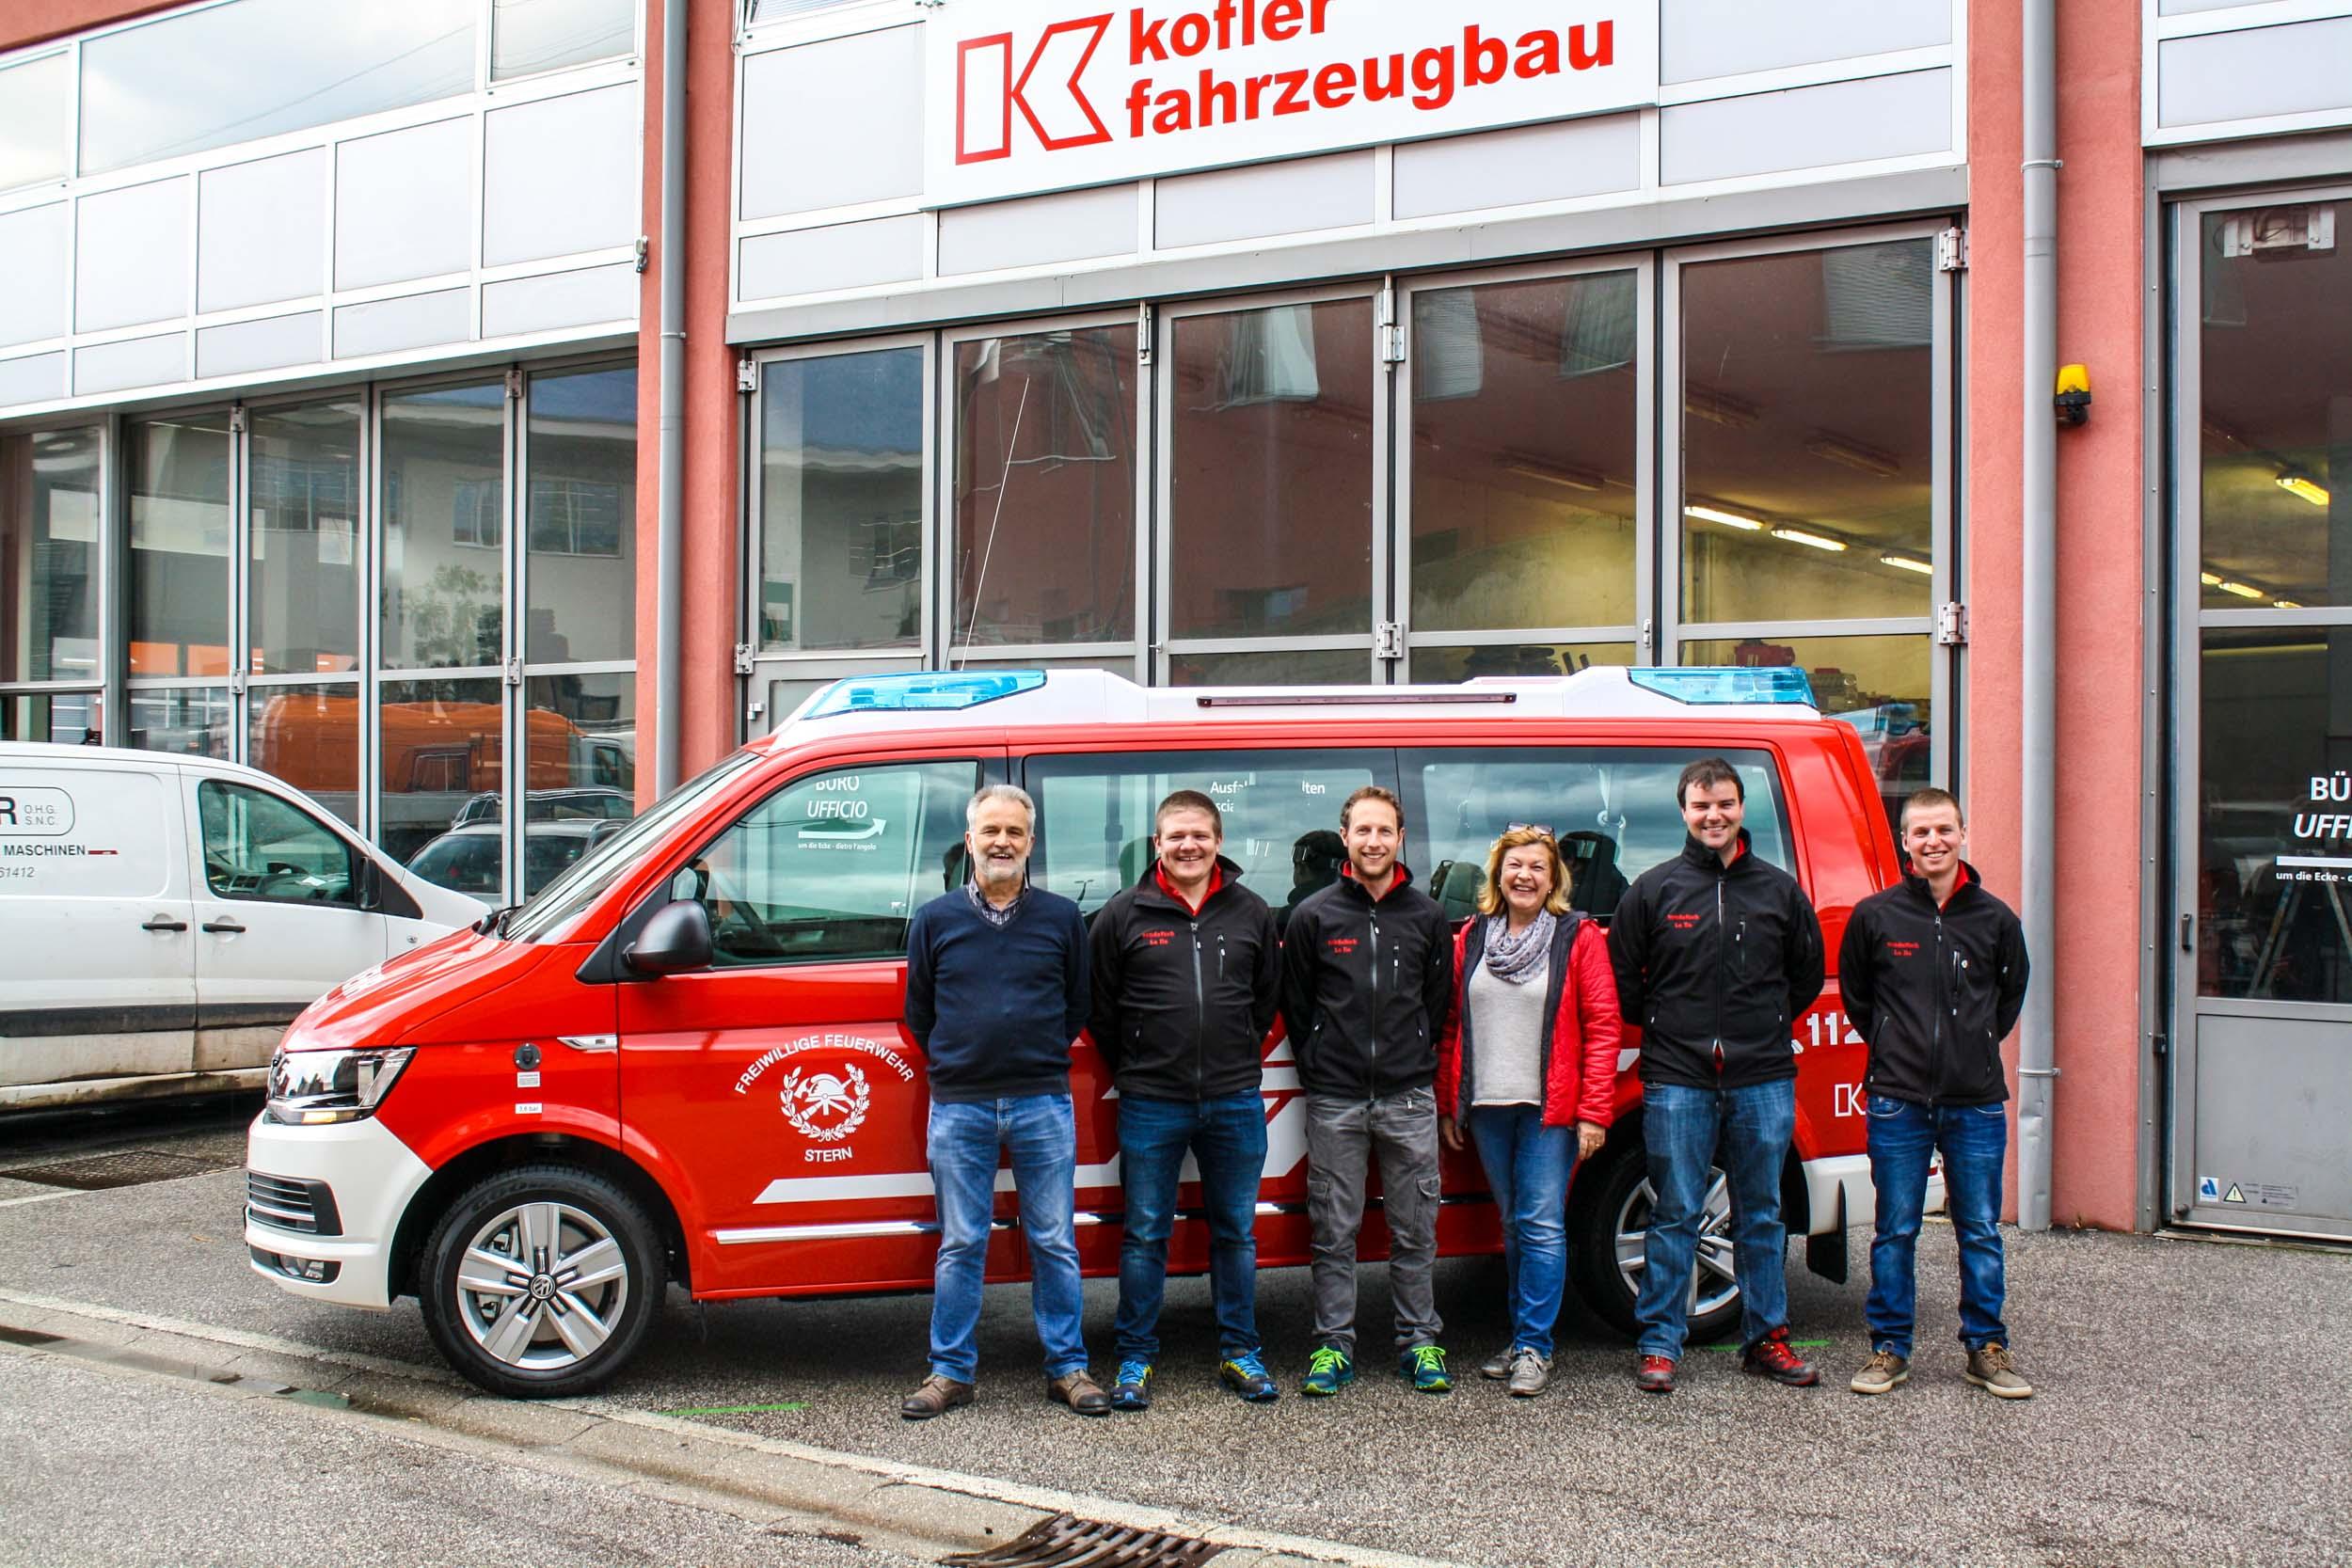 Kofler-Fahrzeugbau-FF-Stern